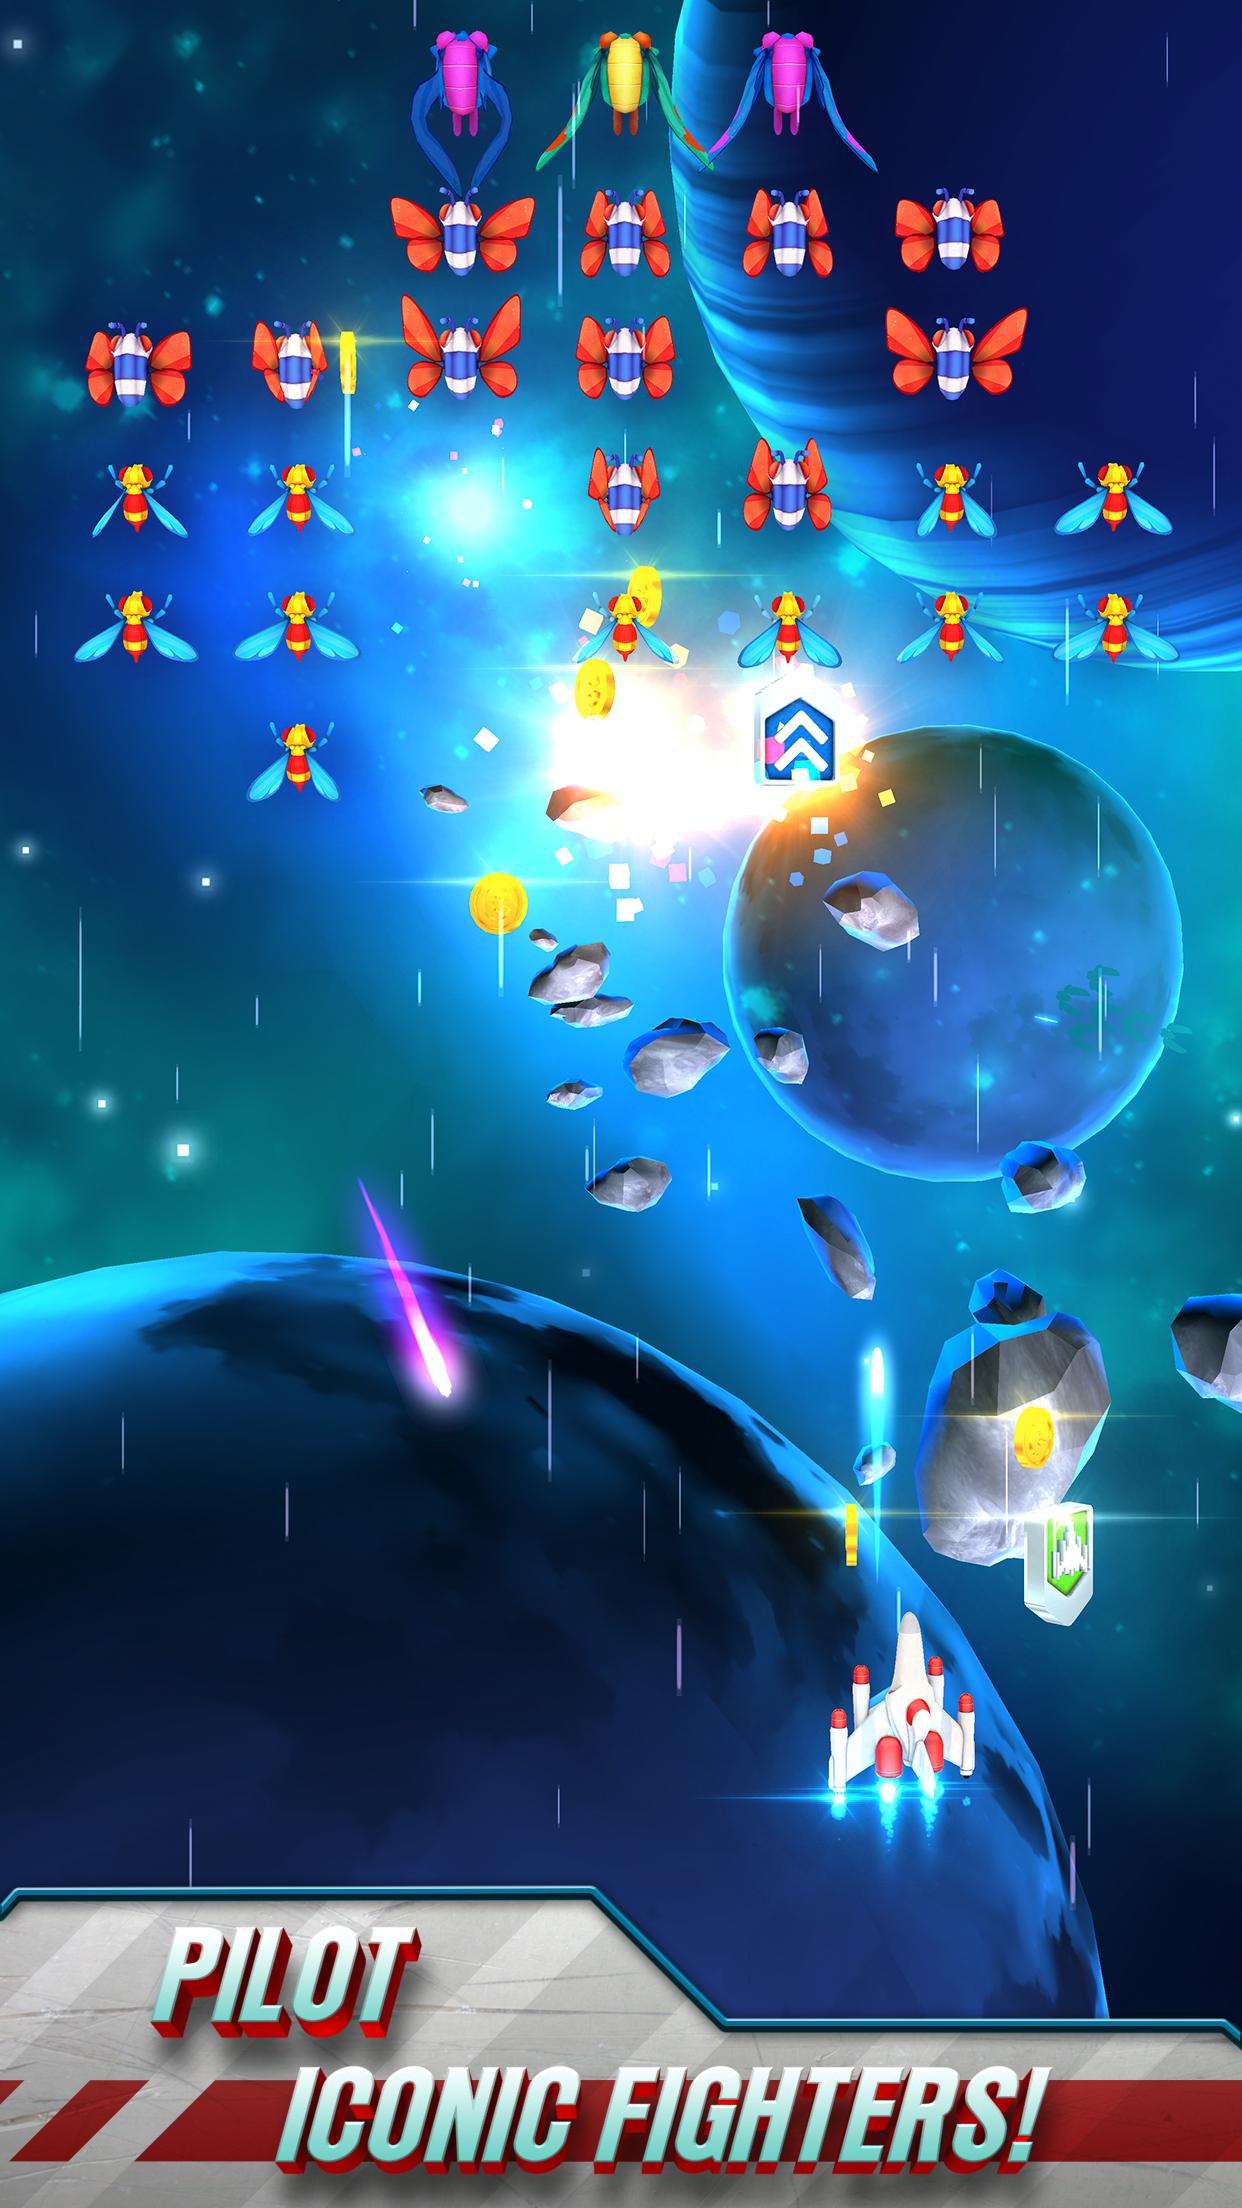 Galaga Wars screenshot #1